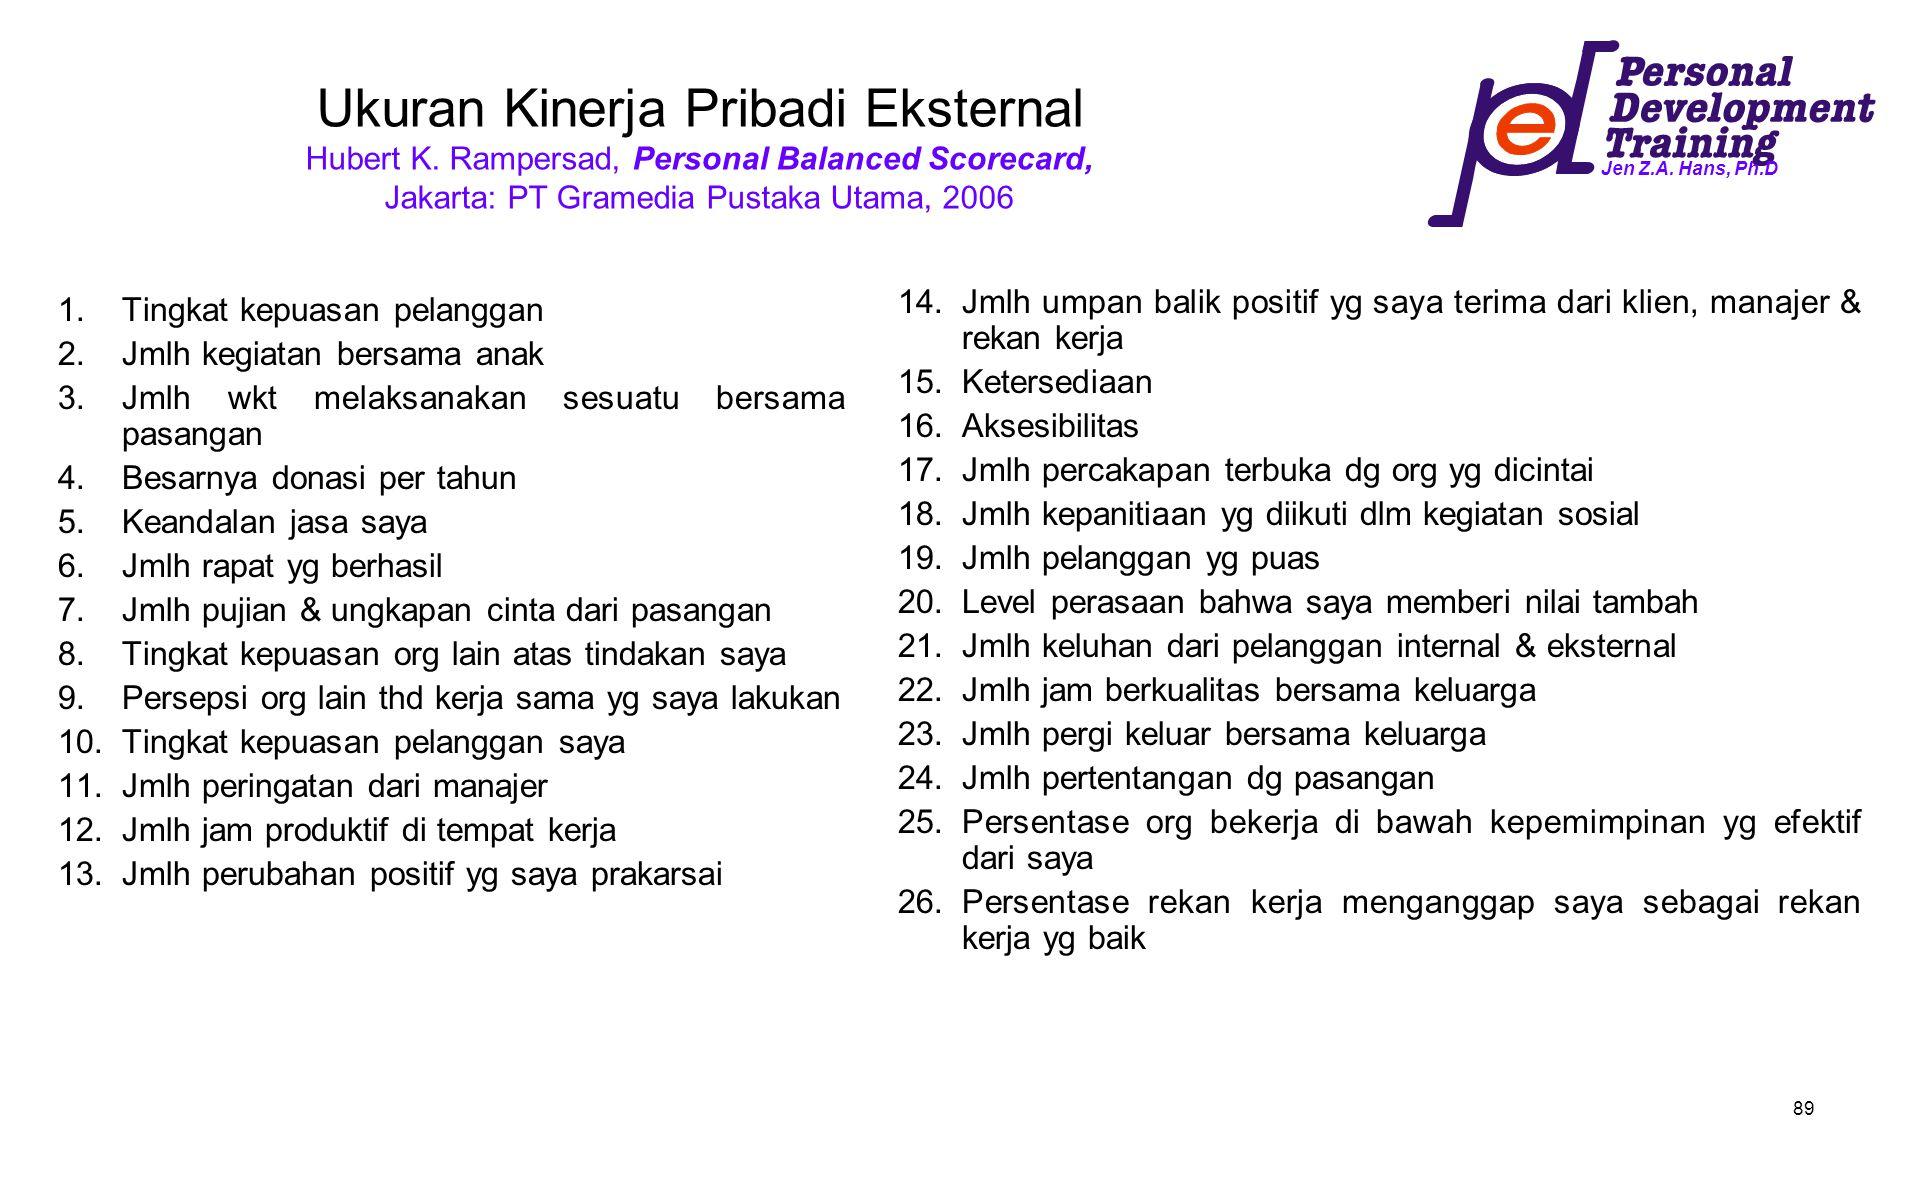 Jen Z.A. Hans, Ph.D 89 Ukuran Kinerja Pribadi Eksternal Hubert K. Rampersad, Personal Balanced Scorecard, Jakarta: PT Gramedia Pustaka Utama, 2006 1.T